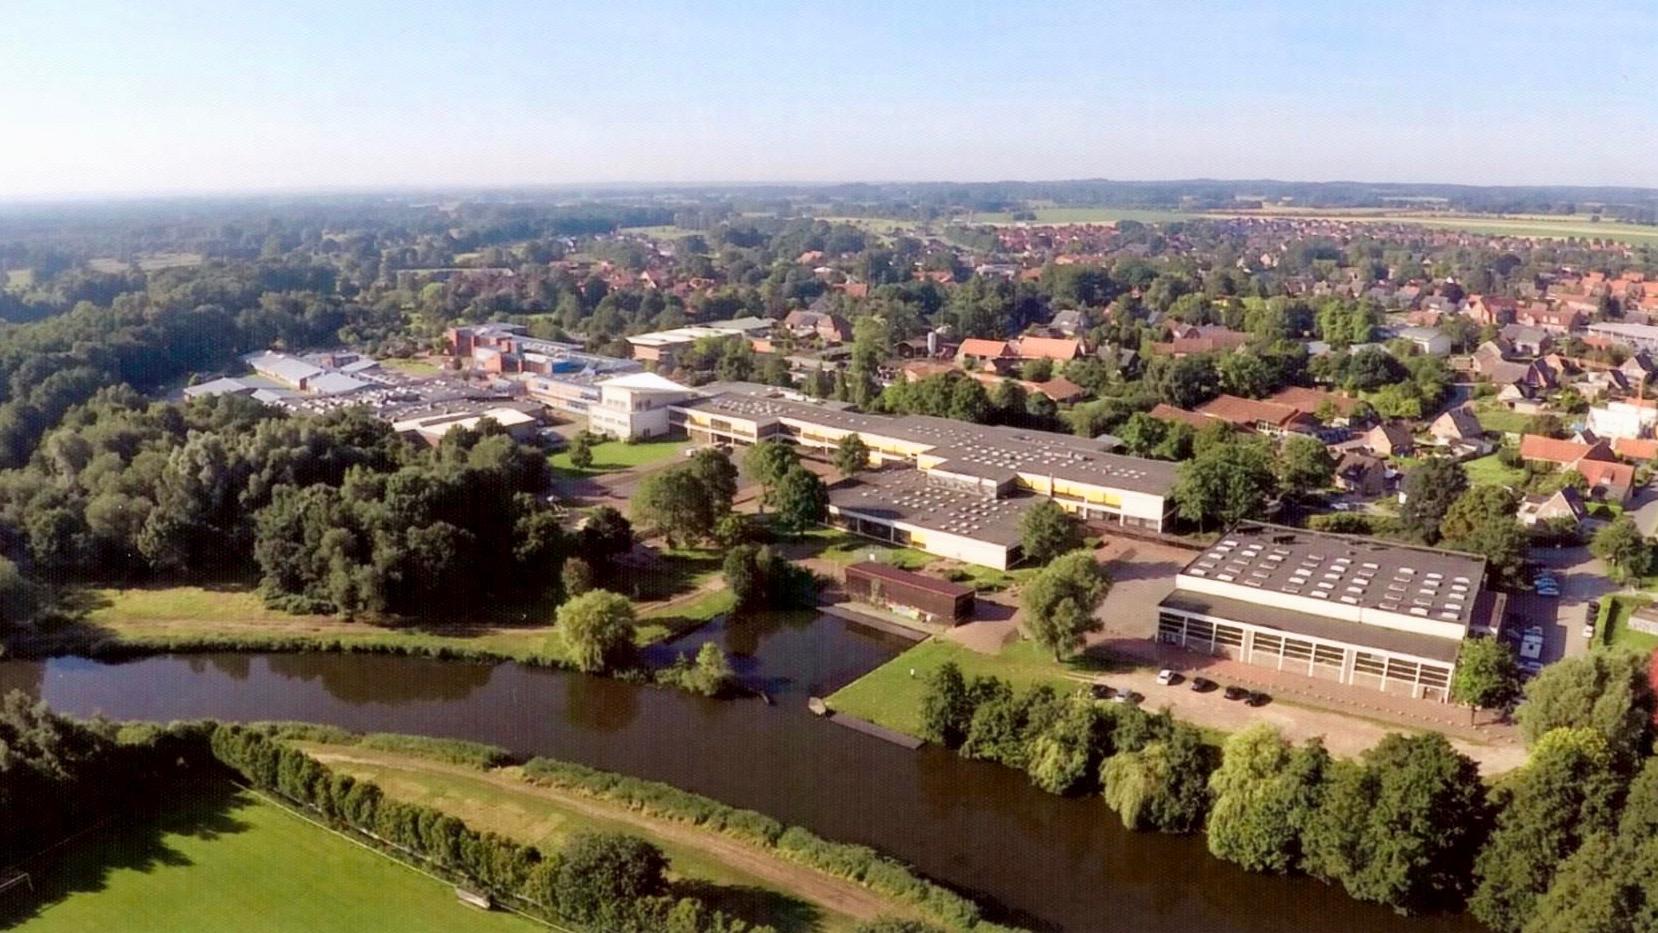 Gymnasium Bersenbrück Vielfältiges Lernen Vielfältige Perspektiven